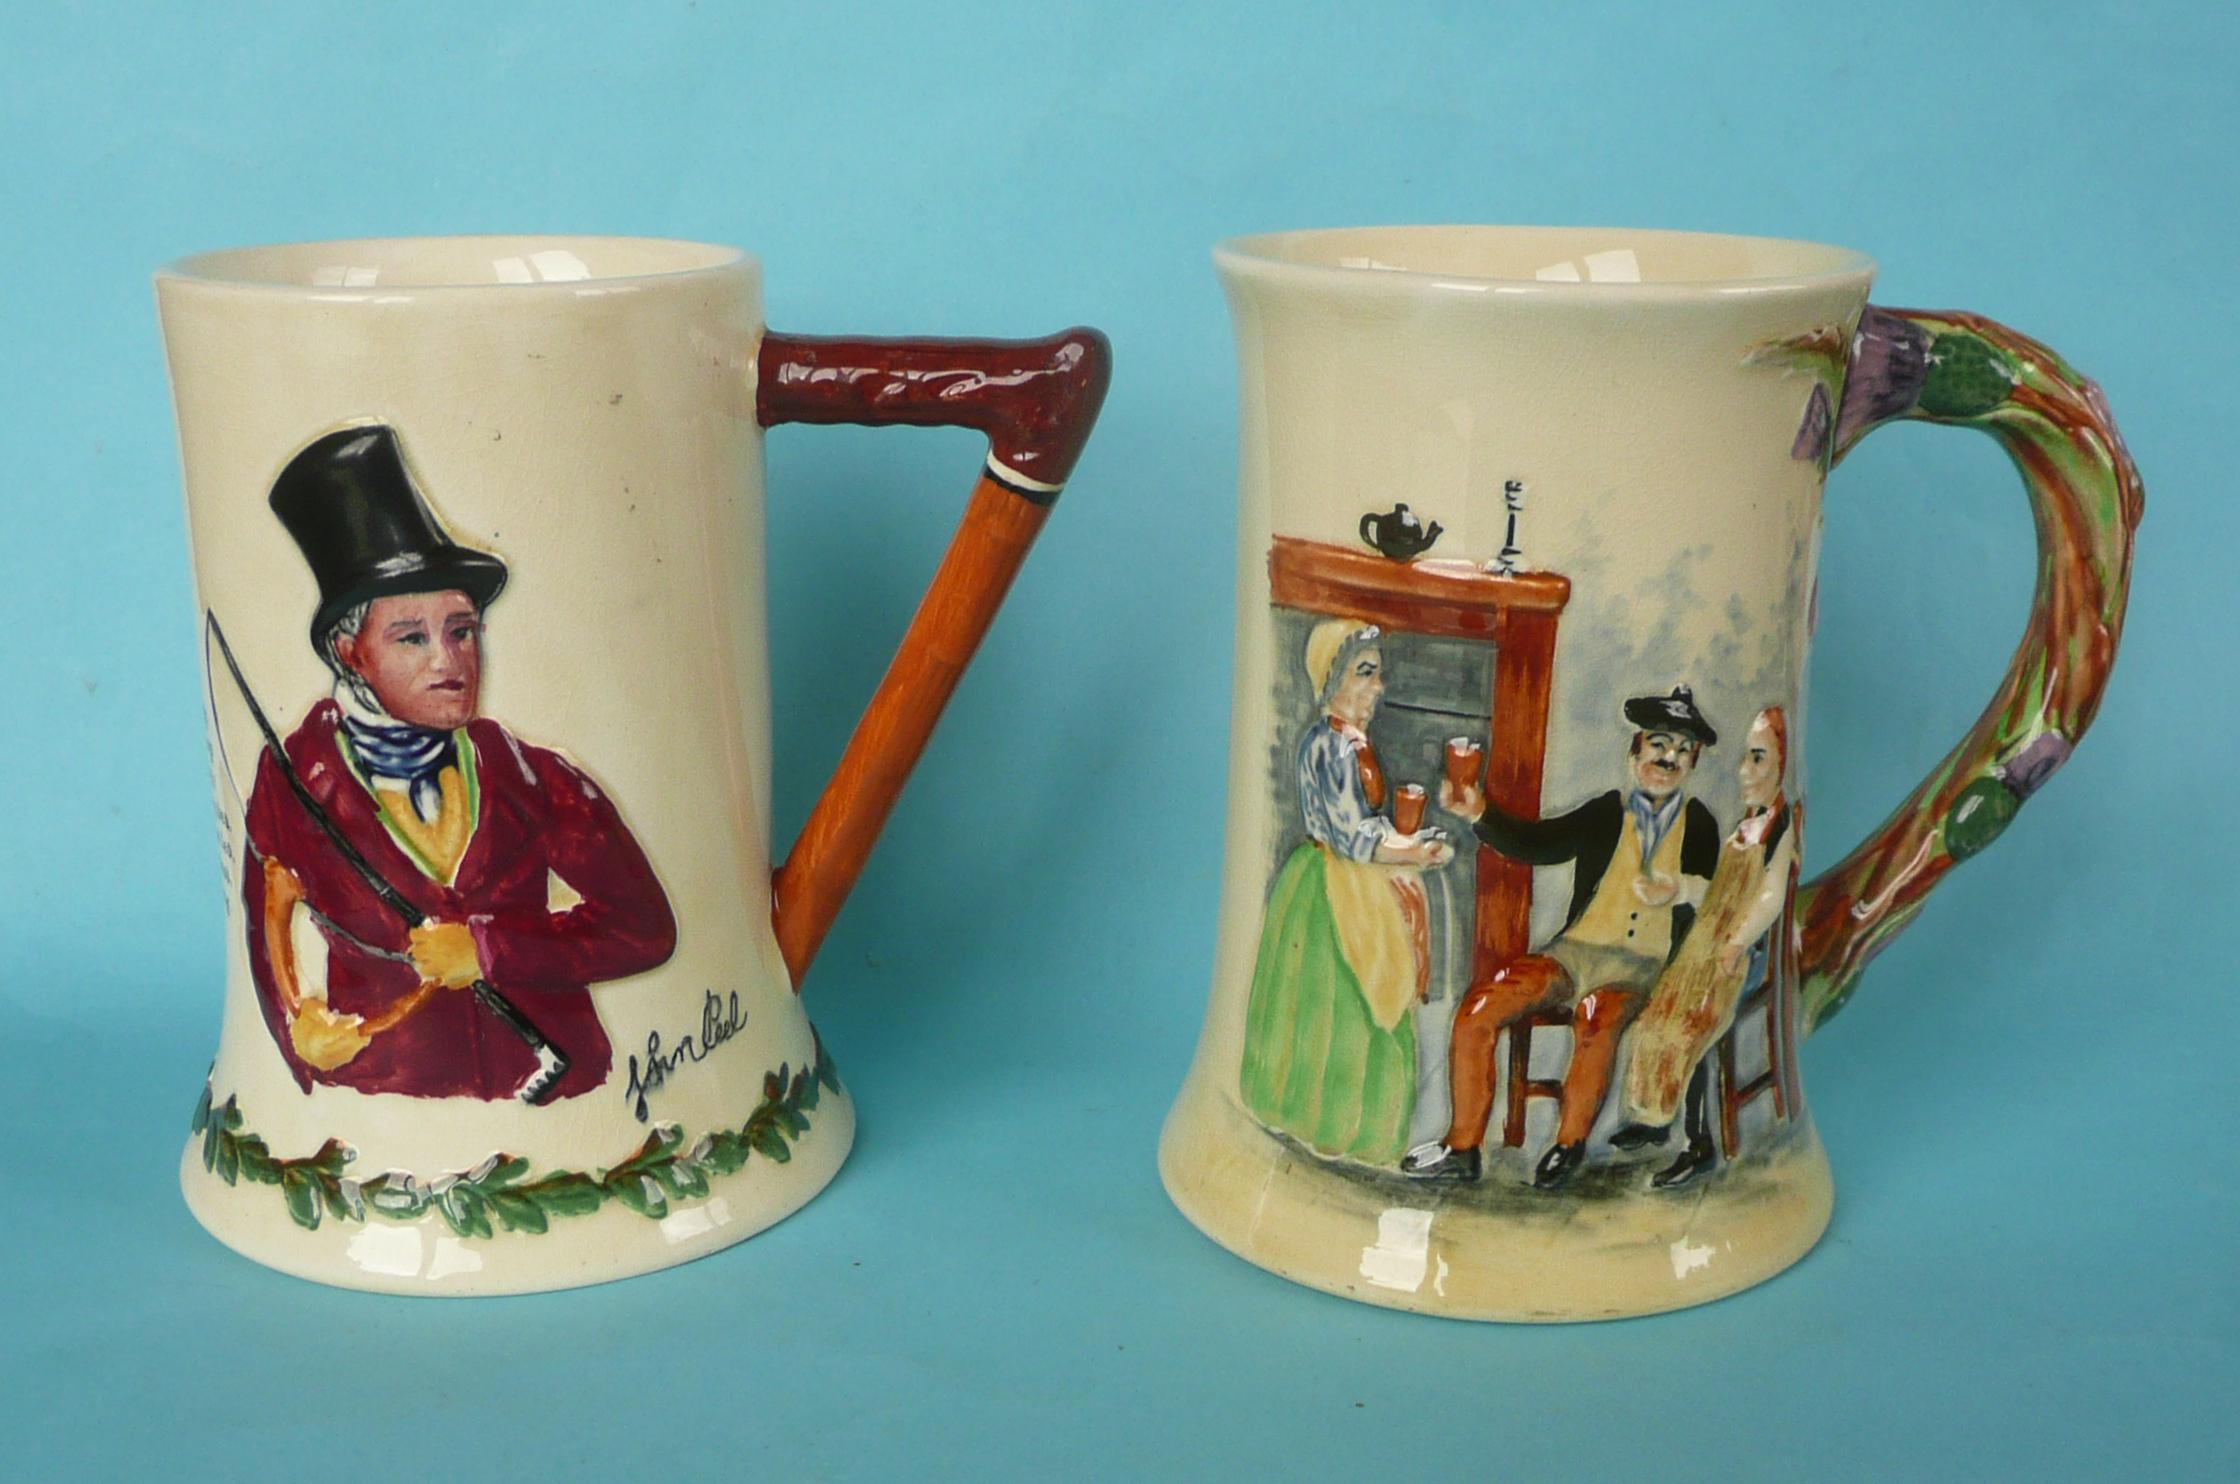 Lot 5 - A good John Peel musical mug to play that air, 151mm and a good Auld Lang Syne mug, both by Crown